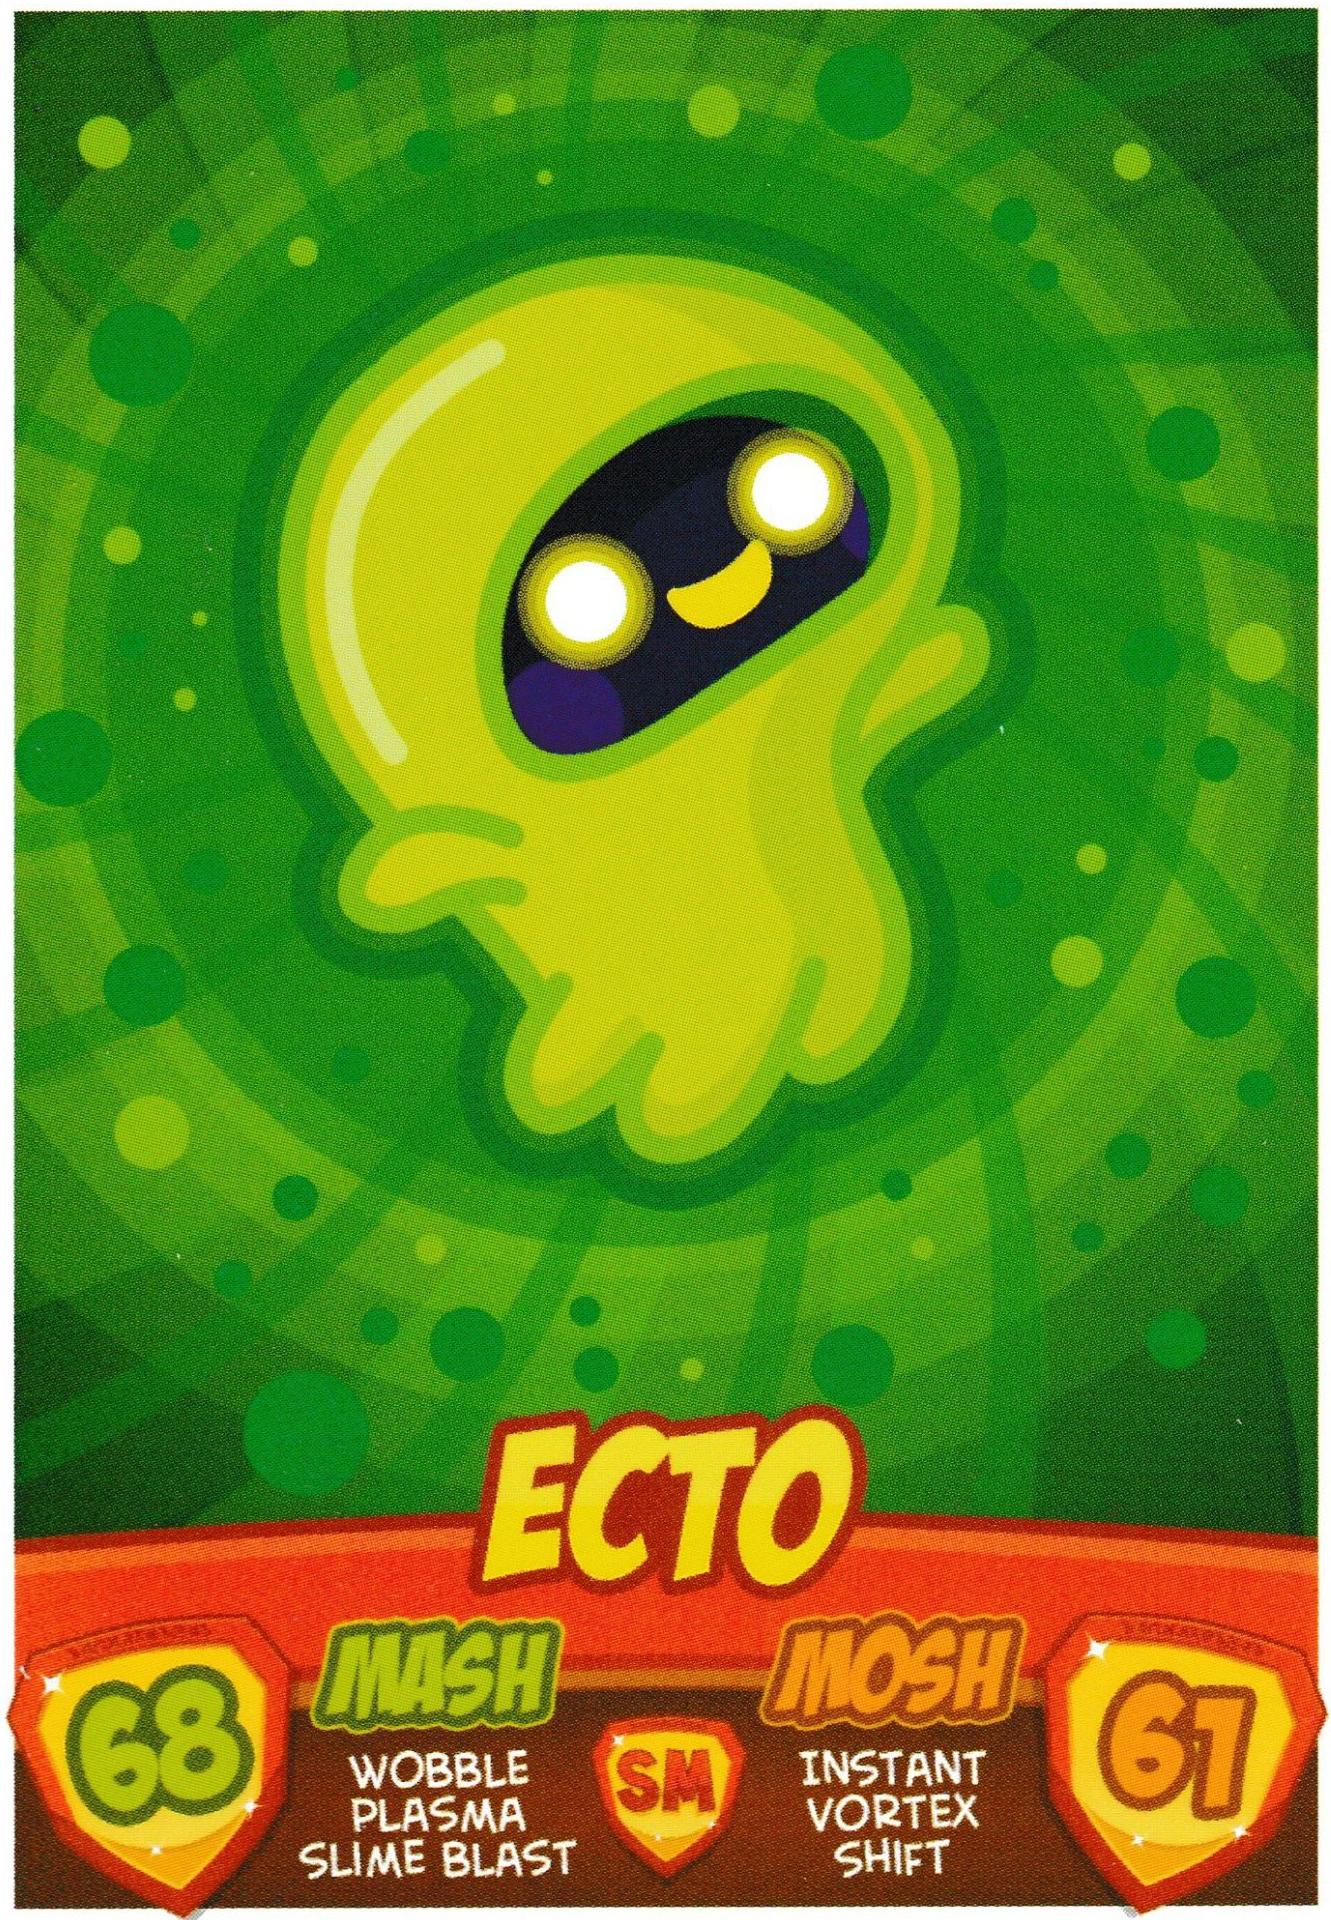 Ecto moshi monsters wiki fandom powered by wikia